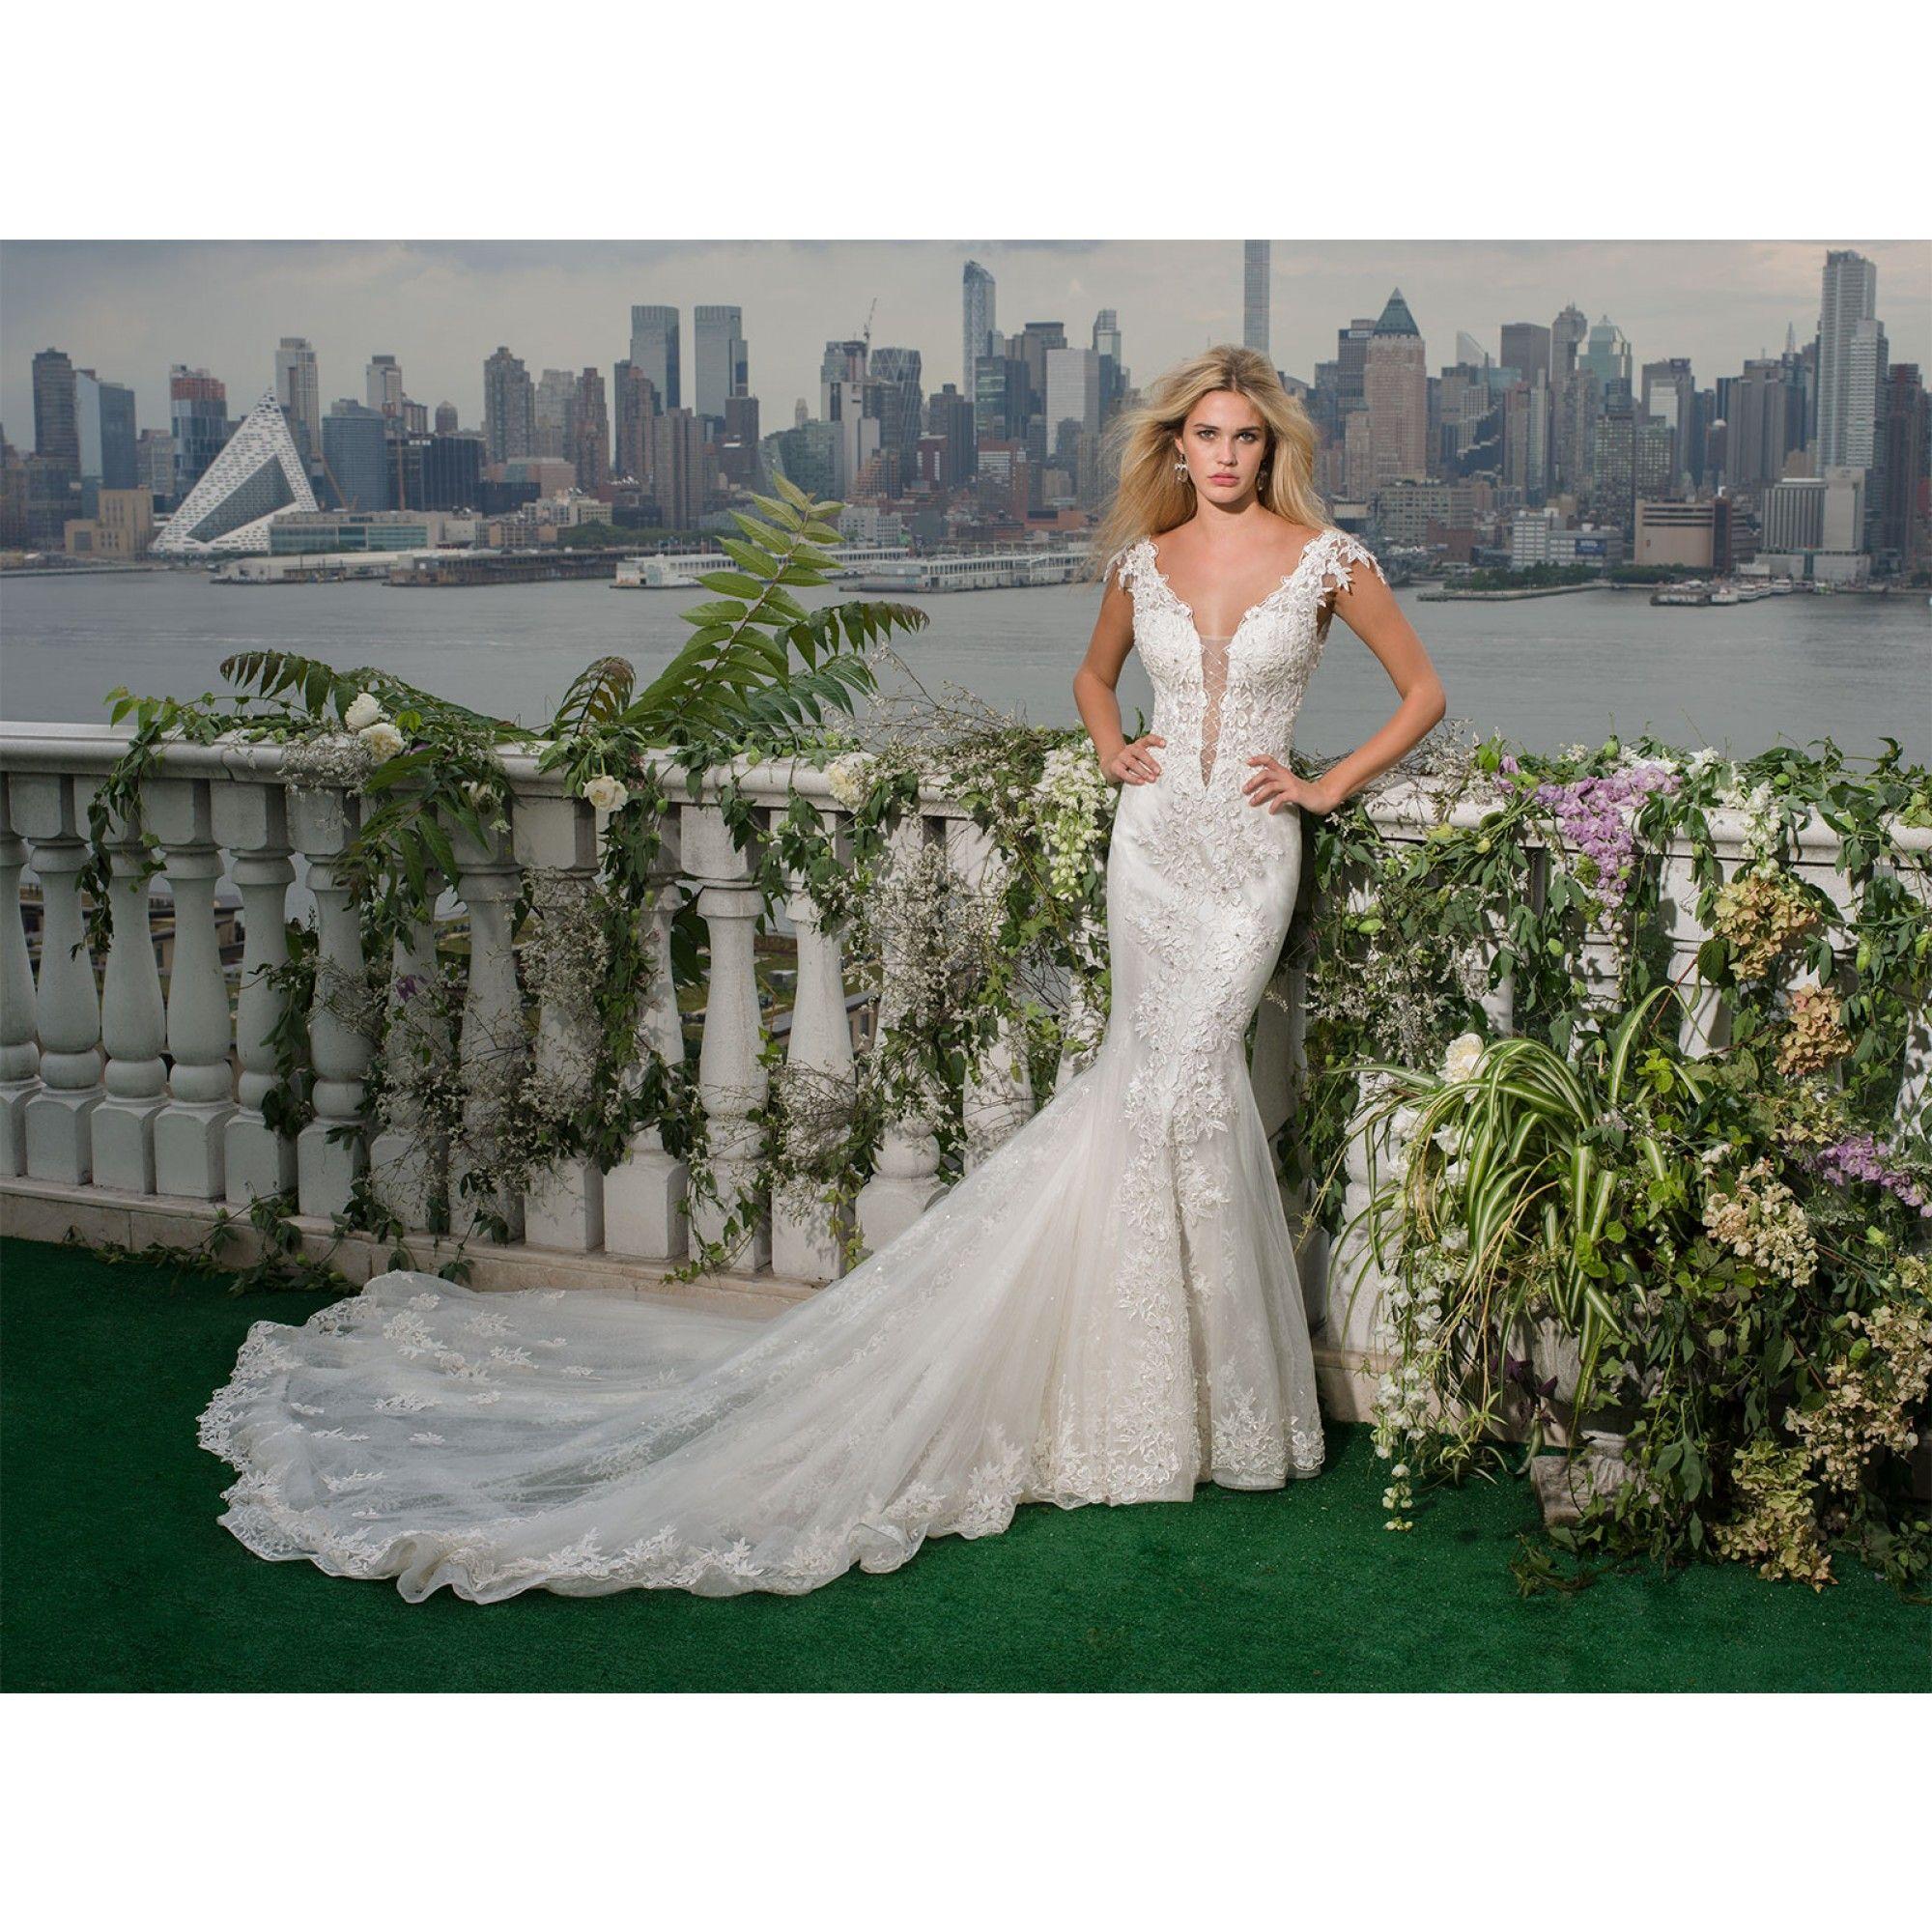 Eve of Milady 4351 Eve of Milady Wedding Dress 4351 Eve of Milady St ...